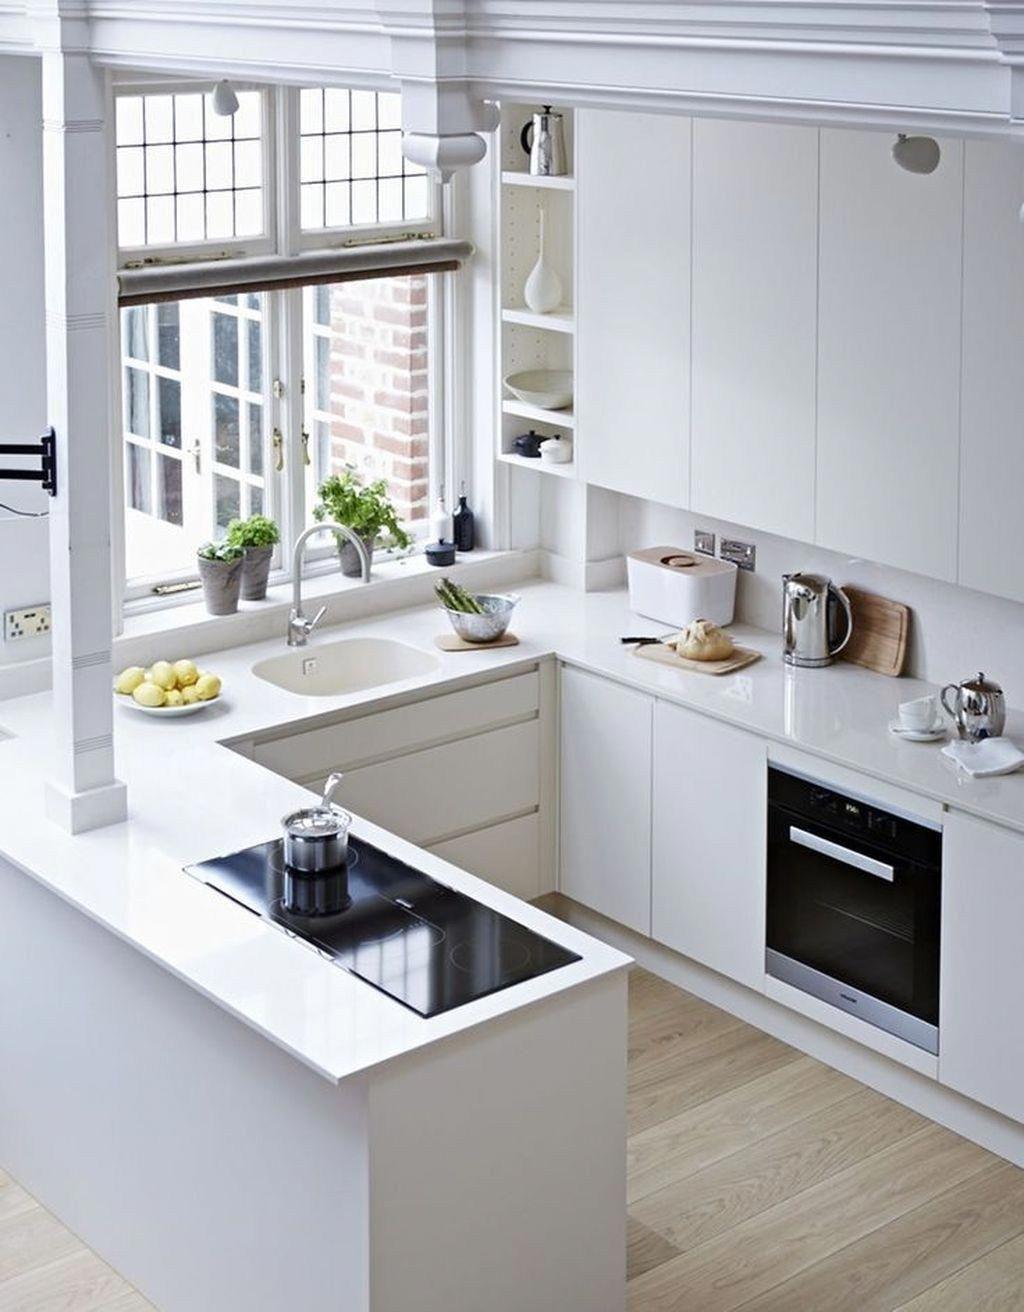 Inspiring Small Modern Kitchen Design Ideas 17 Modernhomedesigns